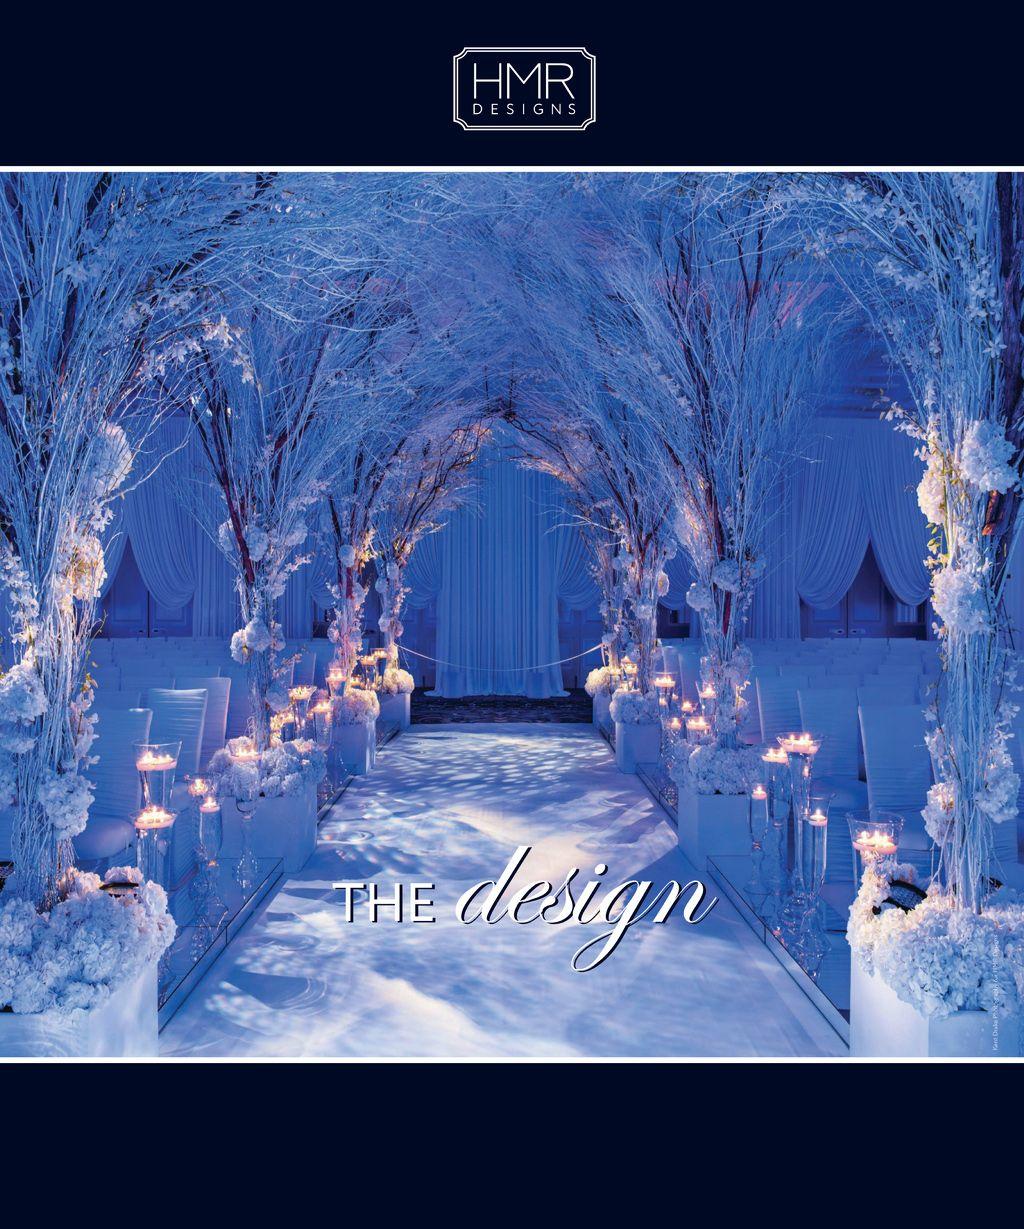 Bbch January 2016 Page 36 Winter Wonderland Wedding Theme Wedding Themes Winter Wonderland Wedding Theme